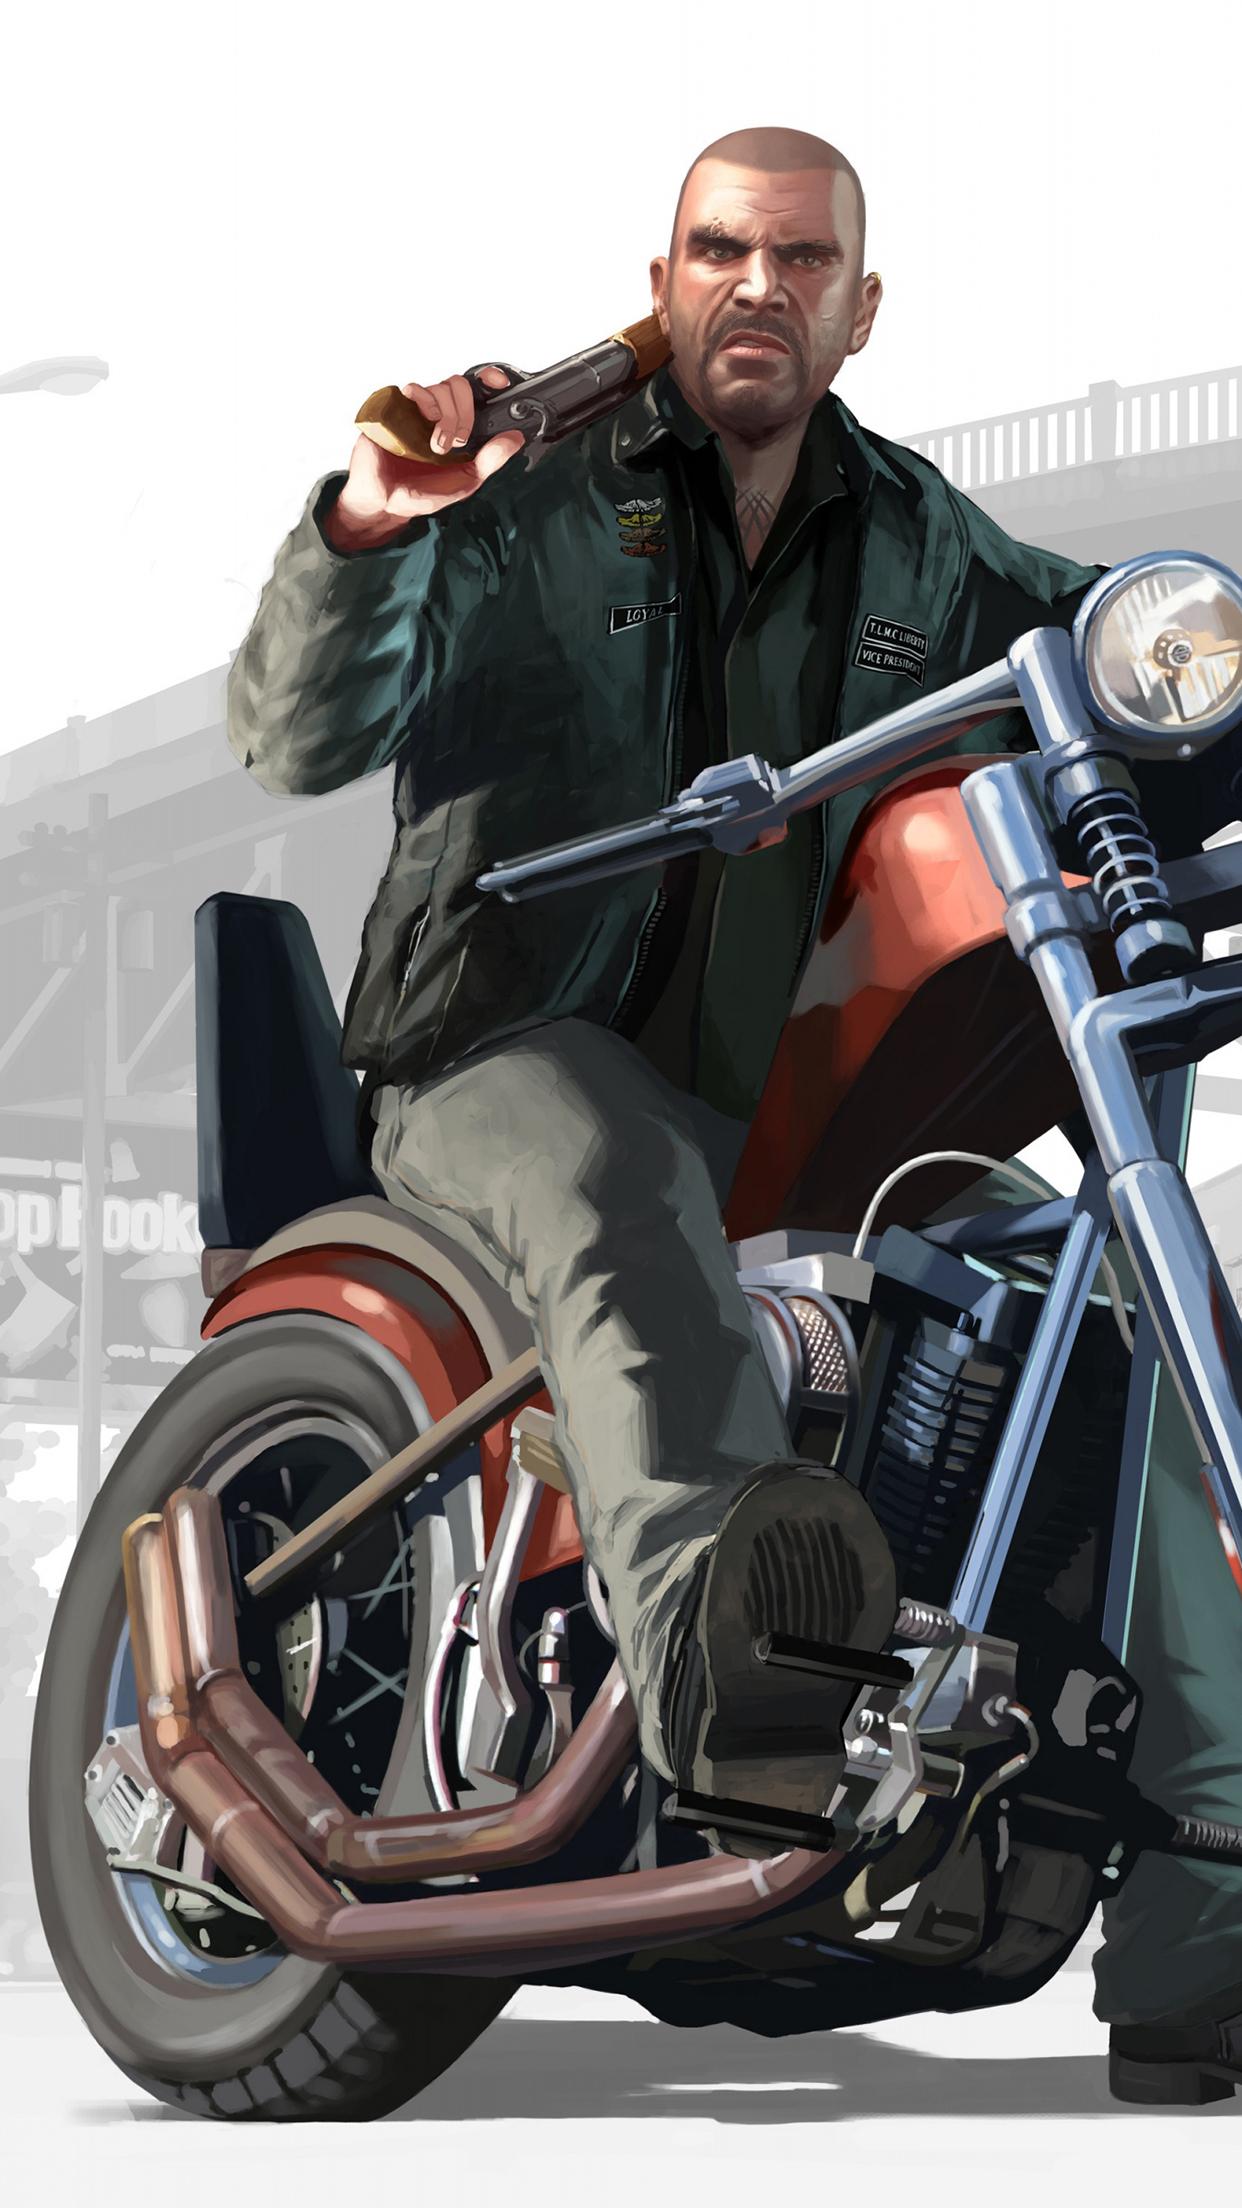 GTA Motorcycle 3Wallpapers iPhone Parallax GTA Motorcycle